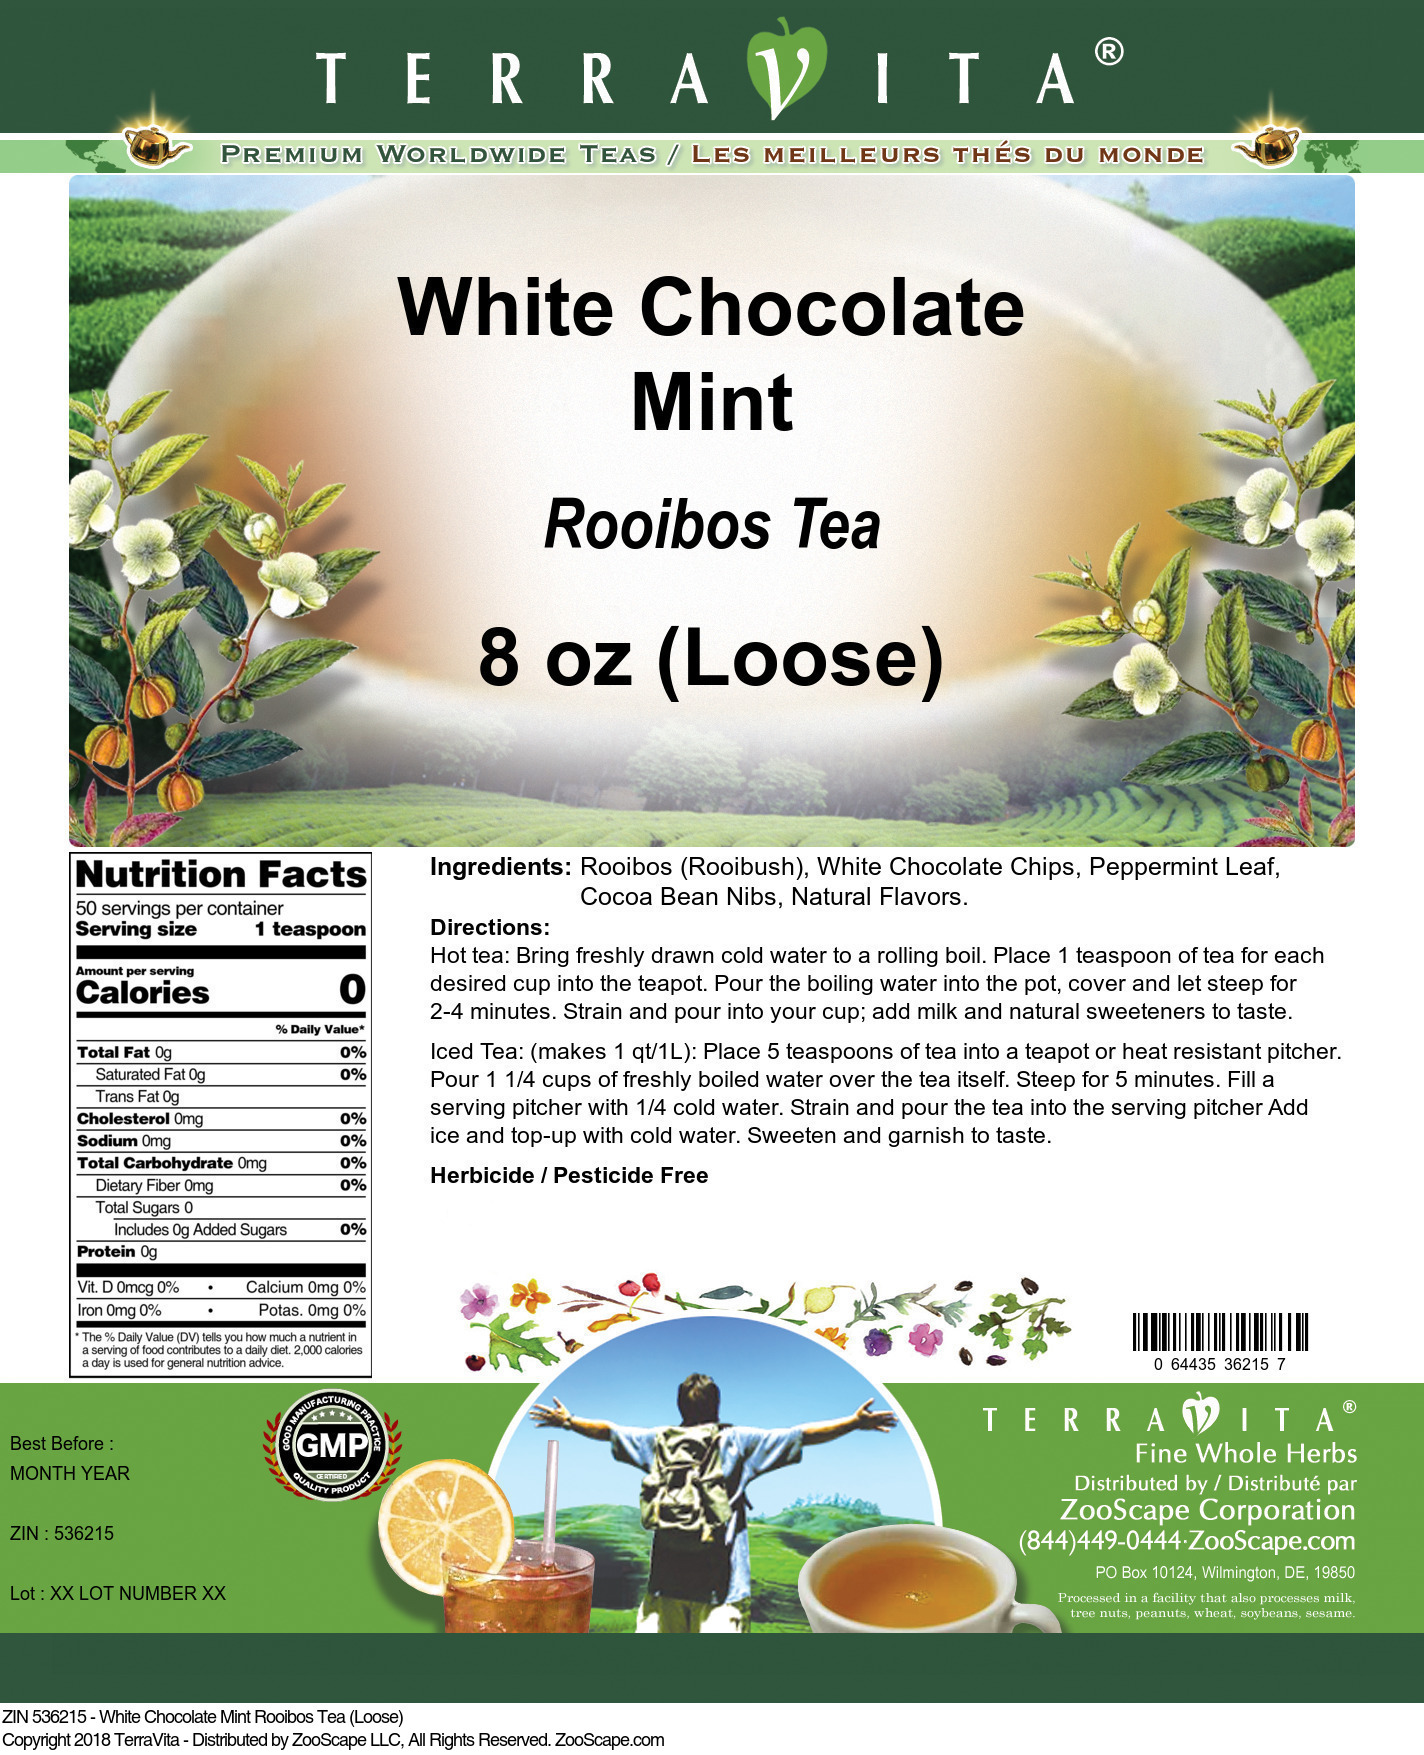 White Chocolate Mint Rooibos Tea (Loose)